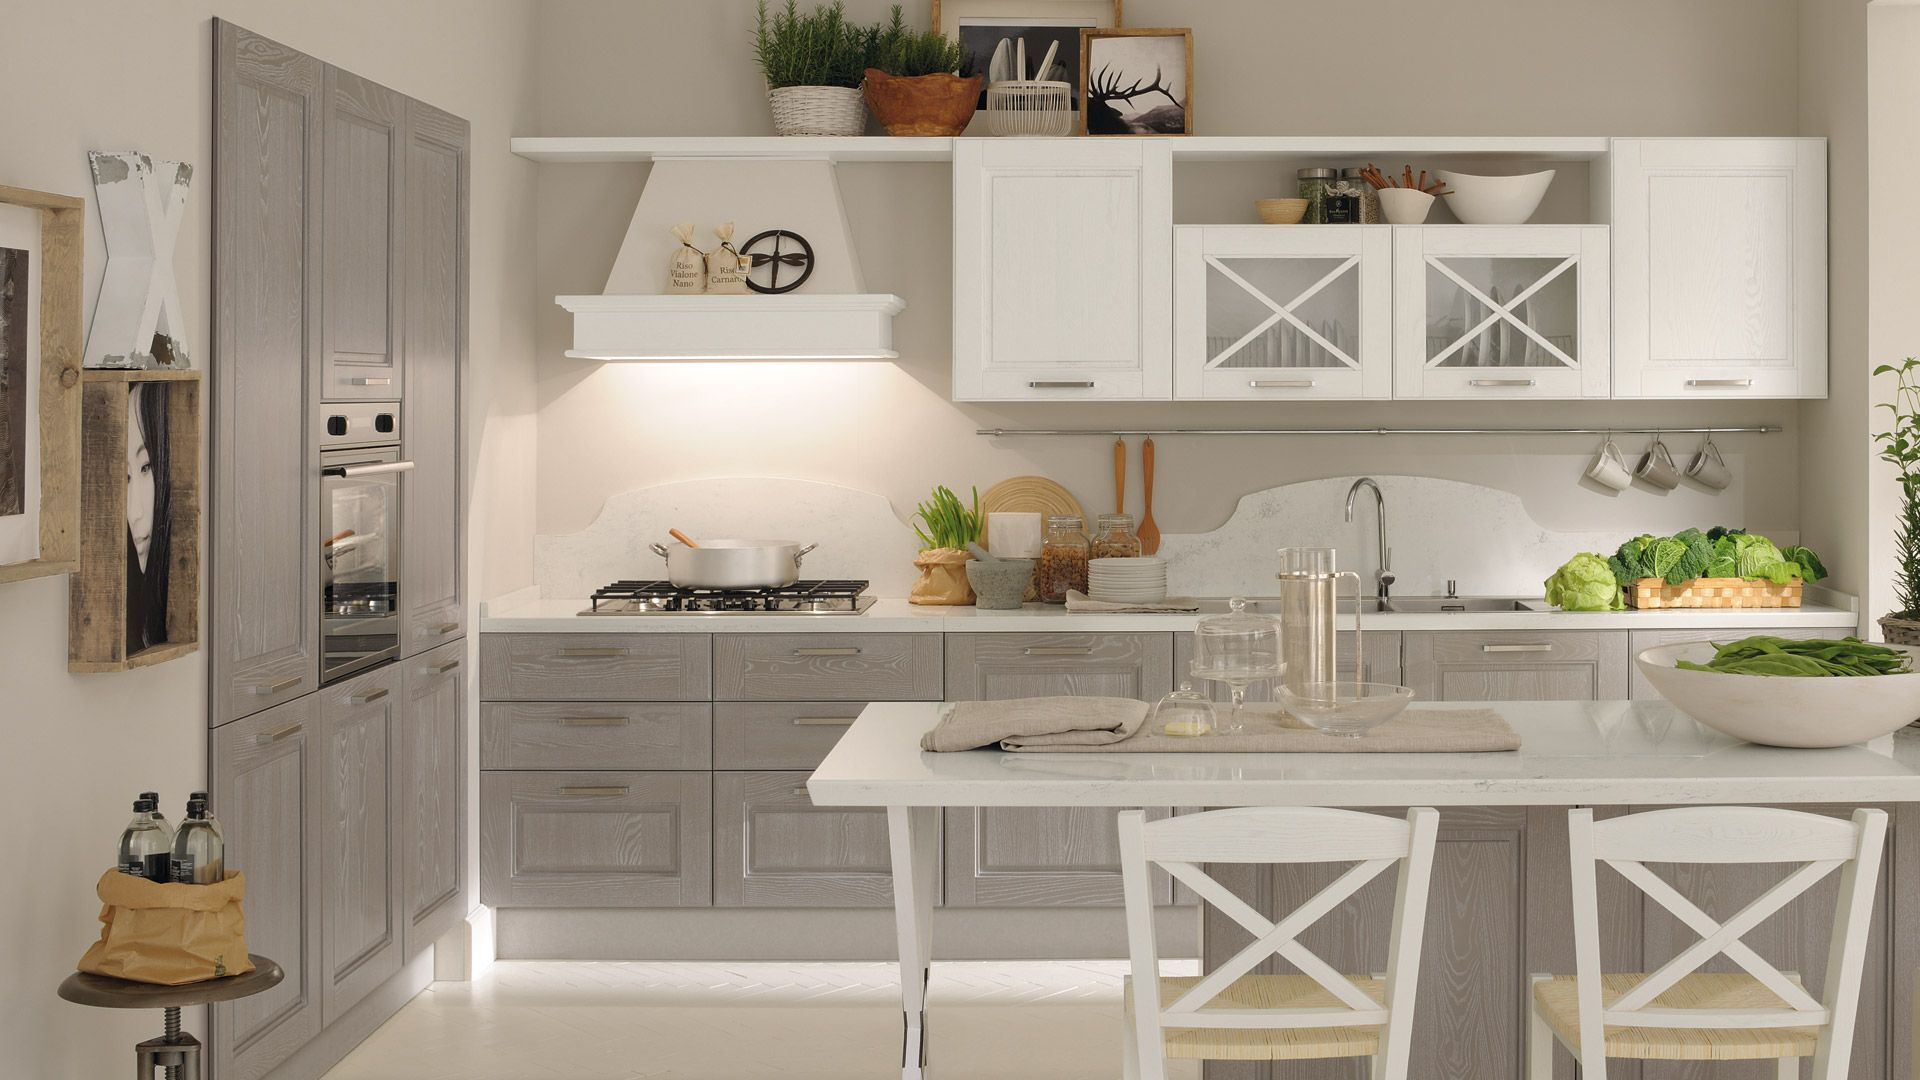 Agnese - Cucine Classiche - Cucine Lube | Salotto-Cucina | Pinterest ...